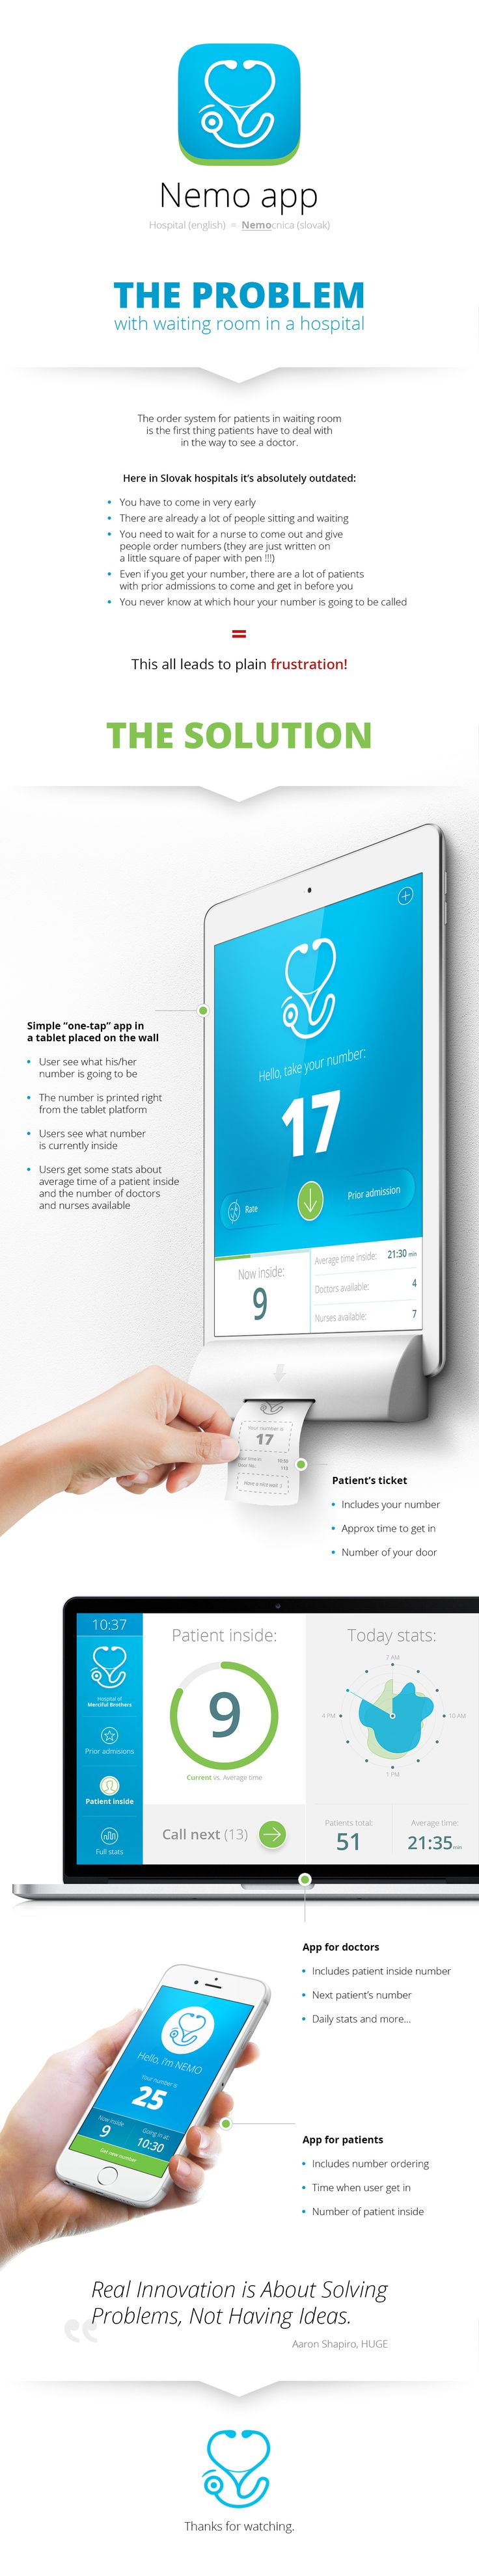 NEMO - hospital waiting room app concept on Behance